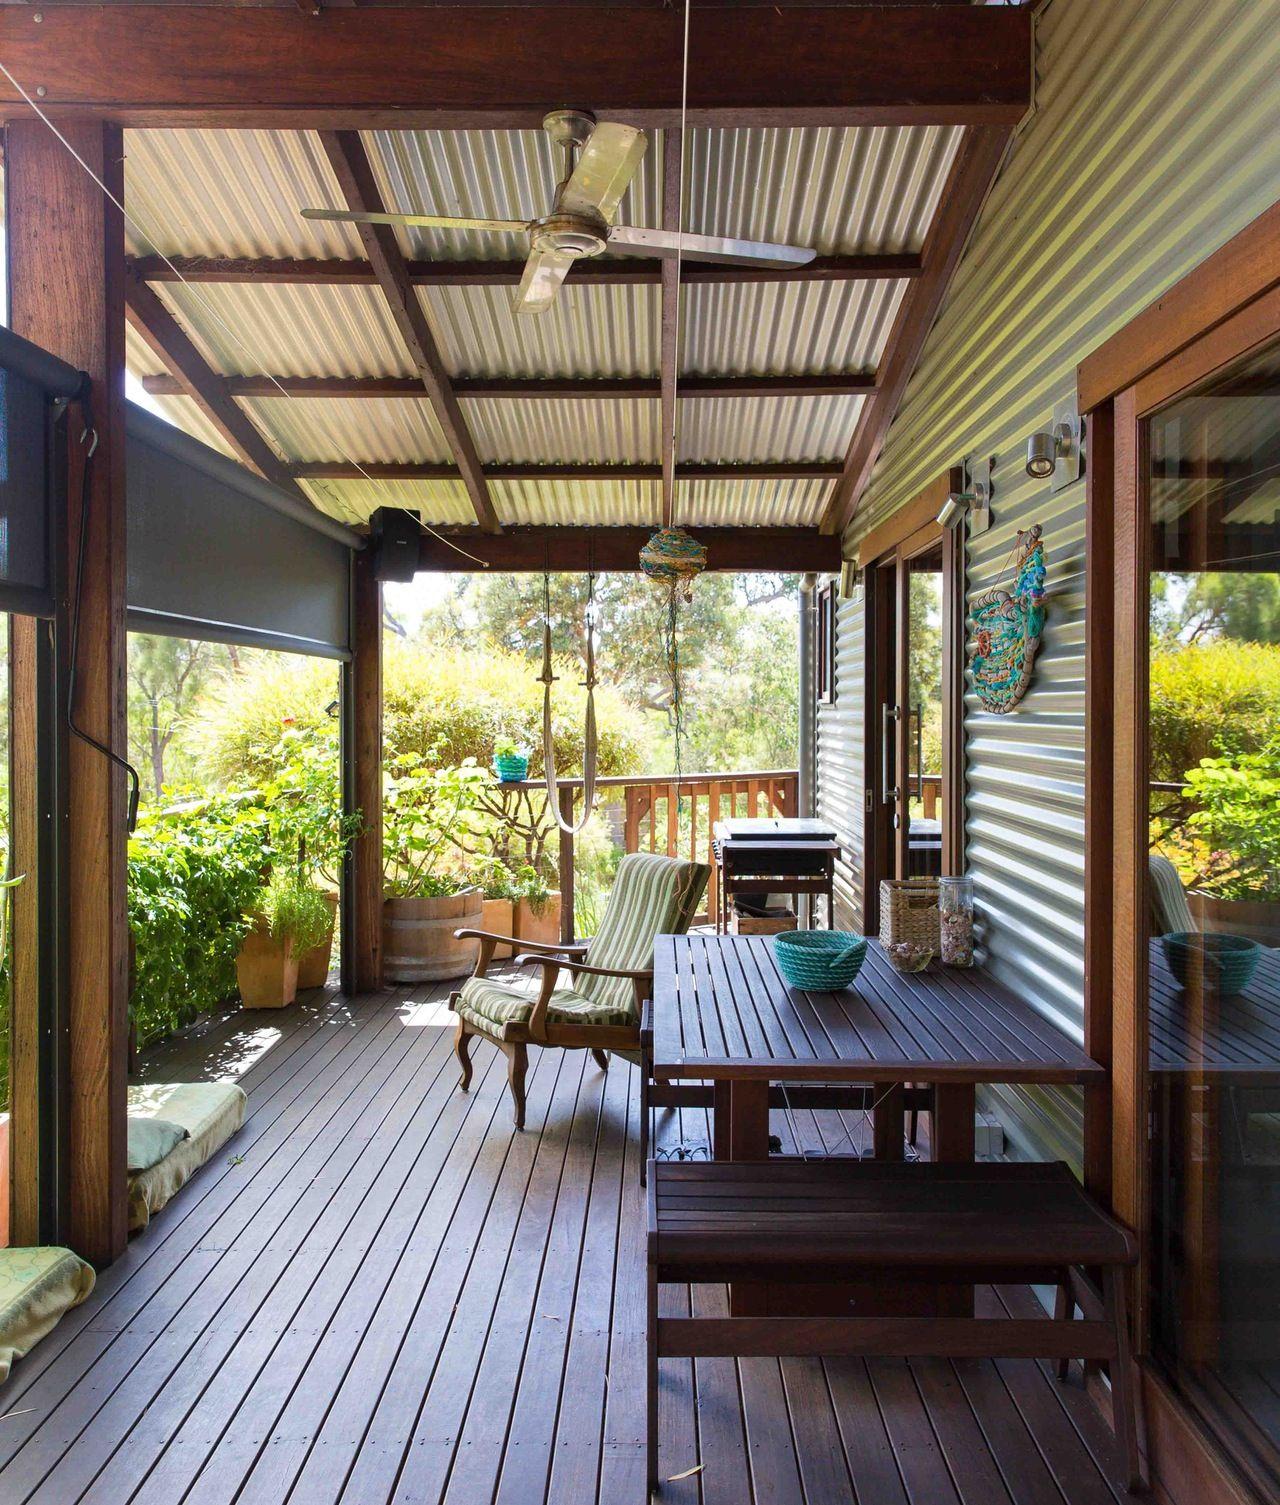 Home Design Ideas Australia: Renee & Adrian S Sustainable Hideaway In Western Australia